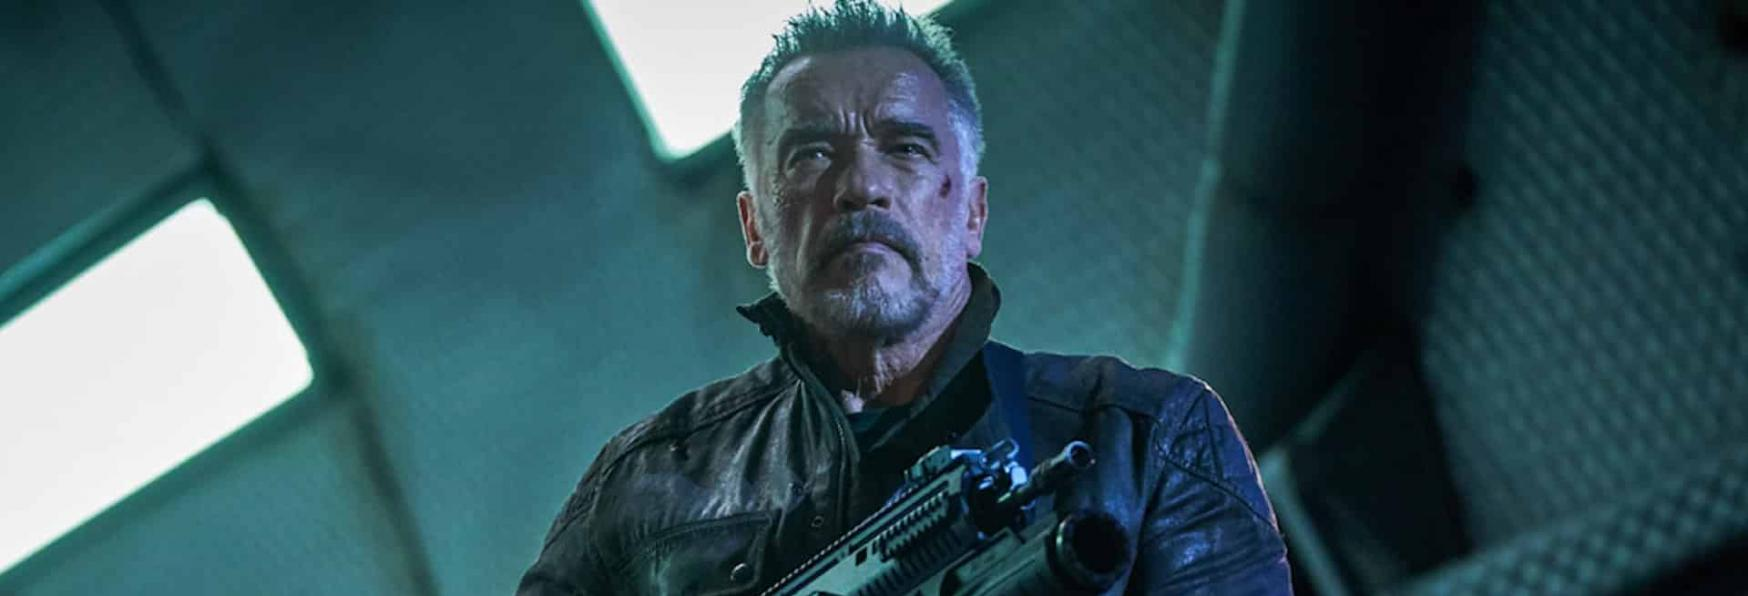 Netflix ordina una nuova Serie TV con Arnold Schwarzenegger